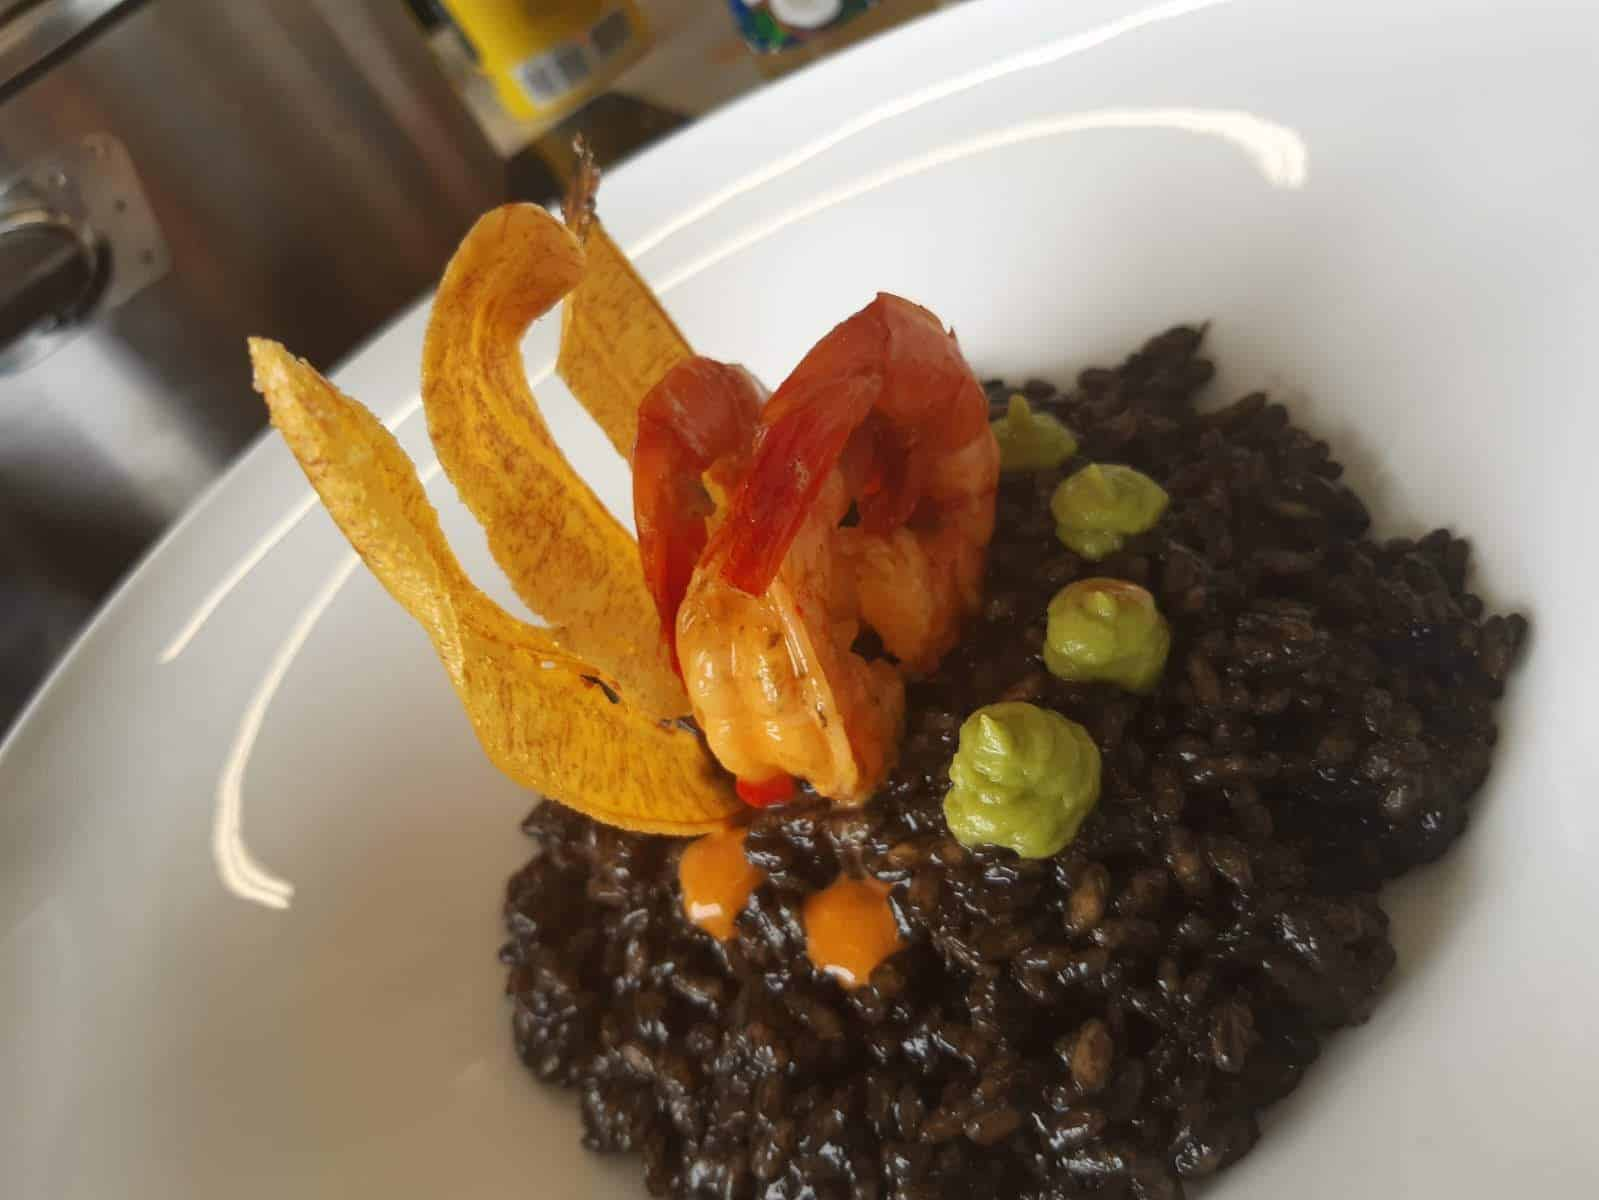 escuela-cocina-villa-retiro-cursos-chef-marianzo-gonzalvo--fran-lopez-estrella-michelin-escuela-tarragona